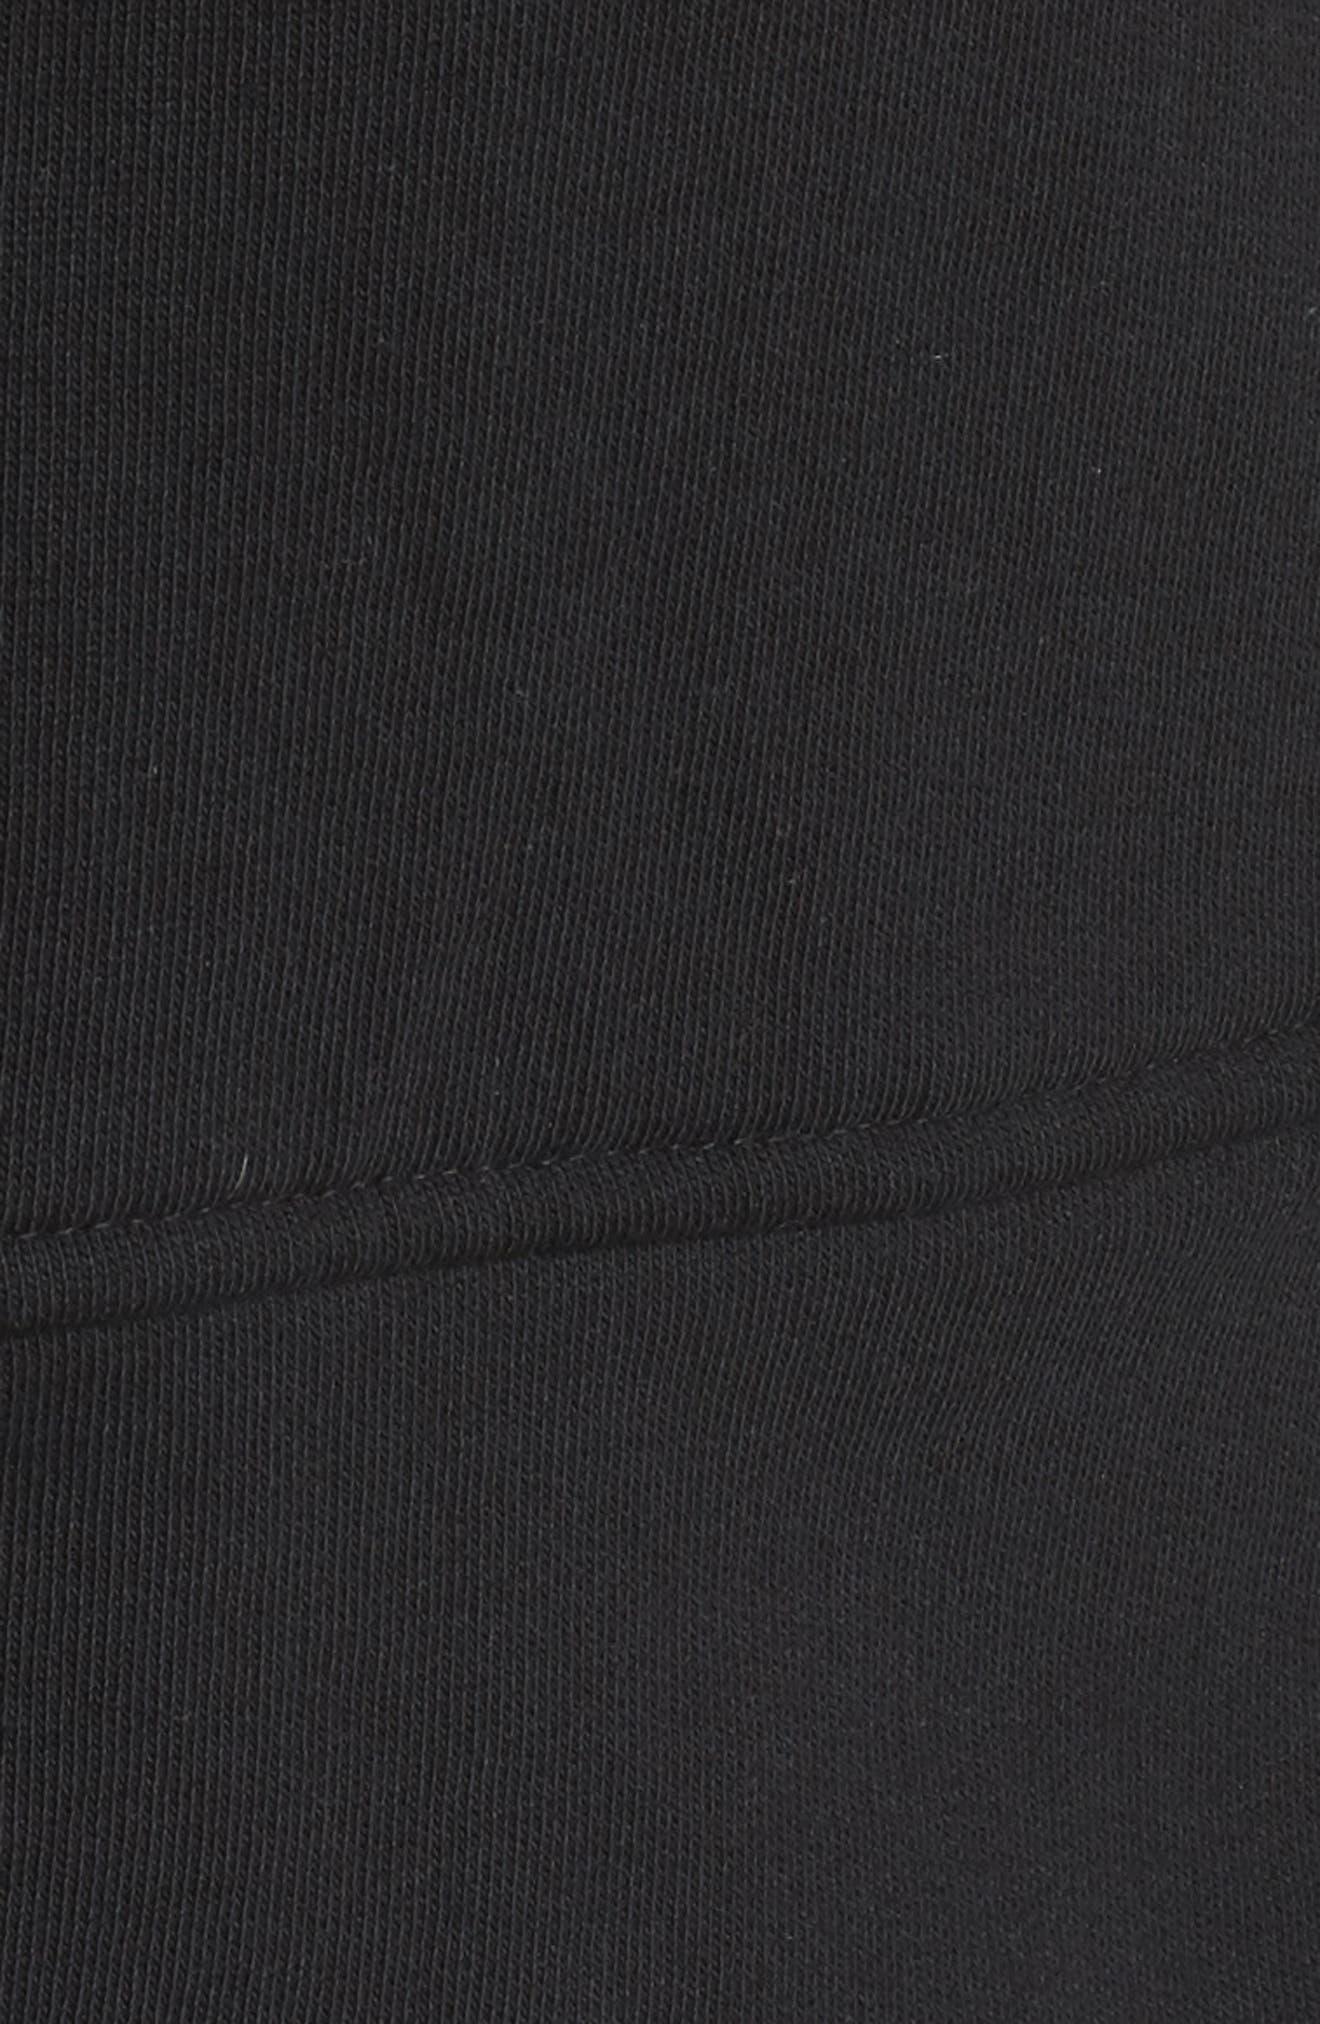 Knit Peplum Jacket,                             Alternate thumbnail 7, color,                             001